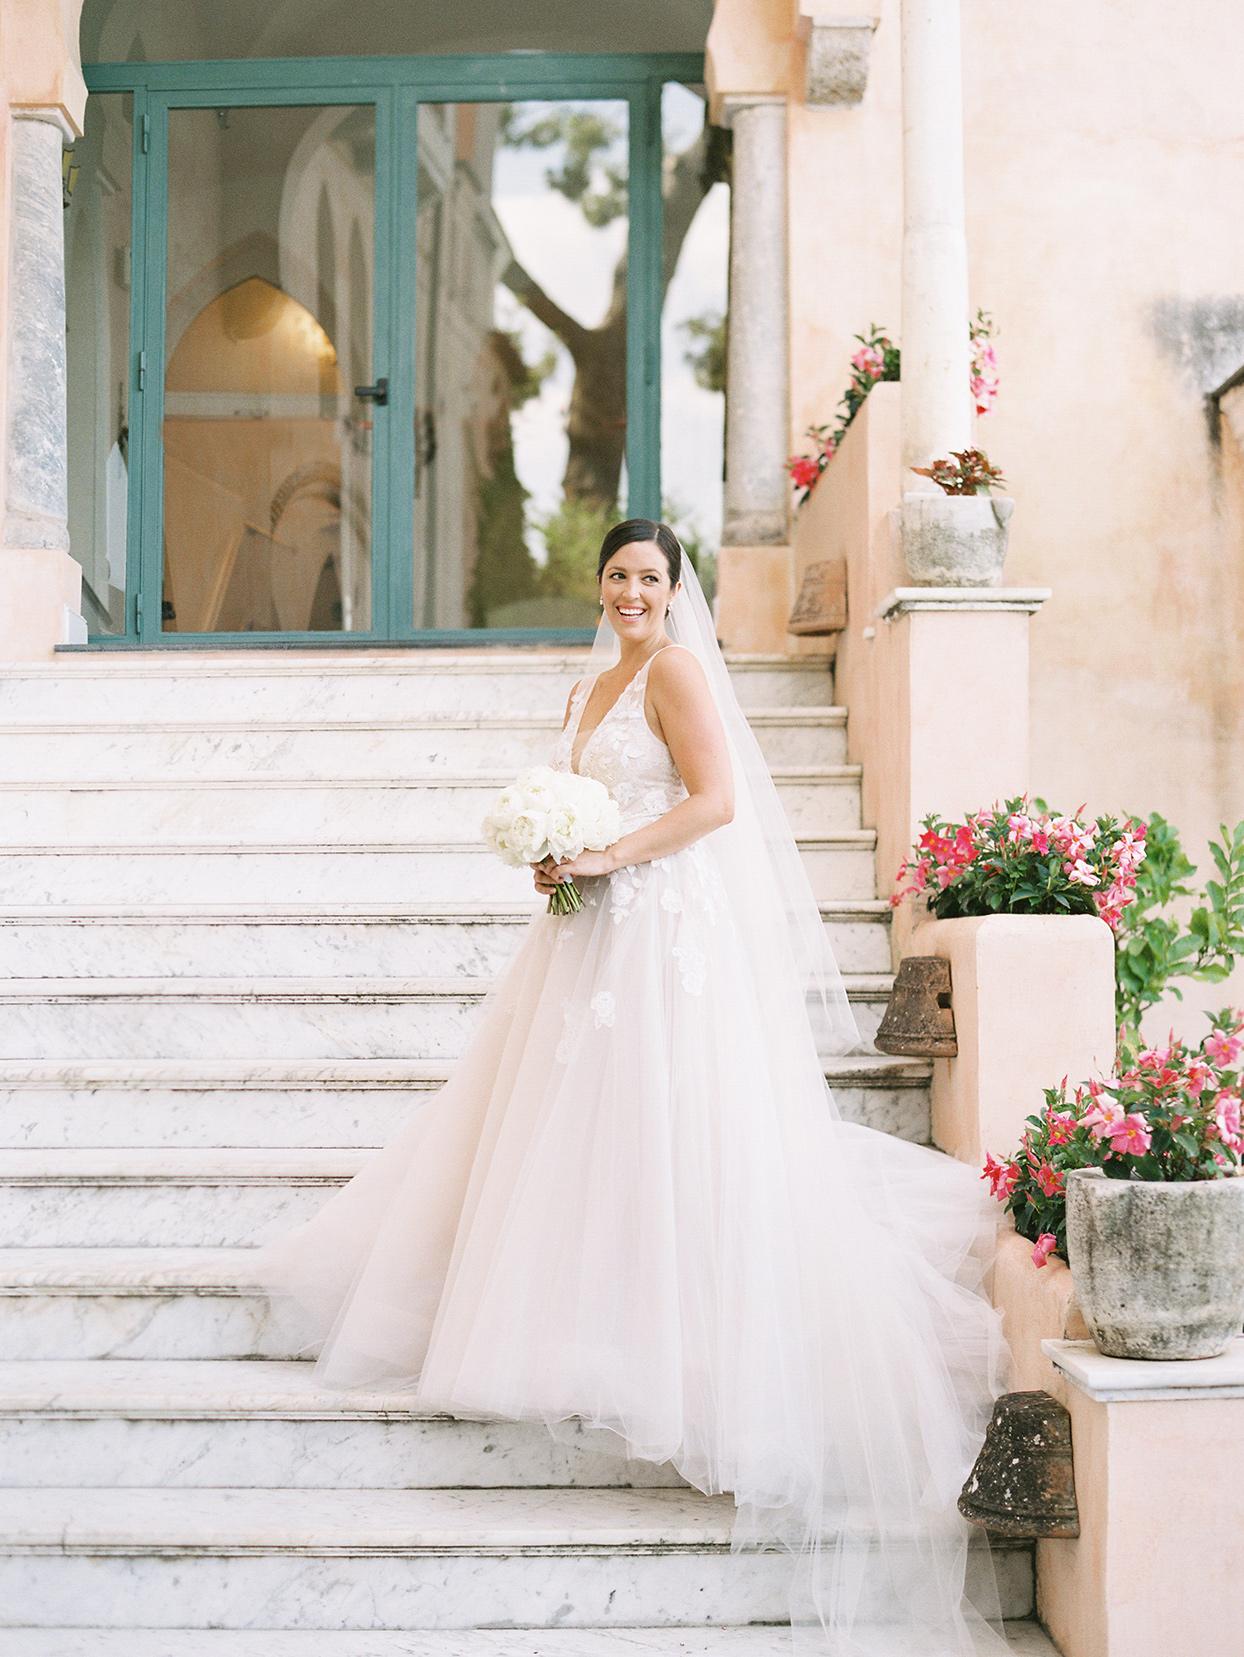 jacqueline david wedding bride on marble steps